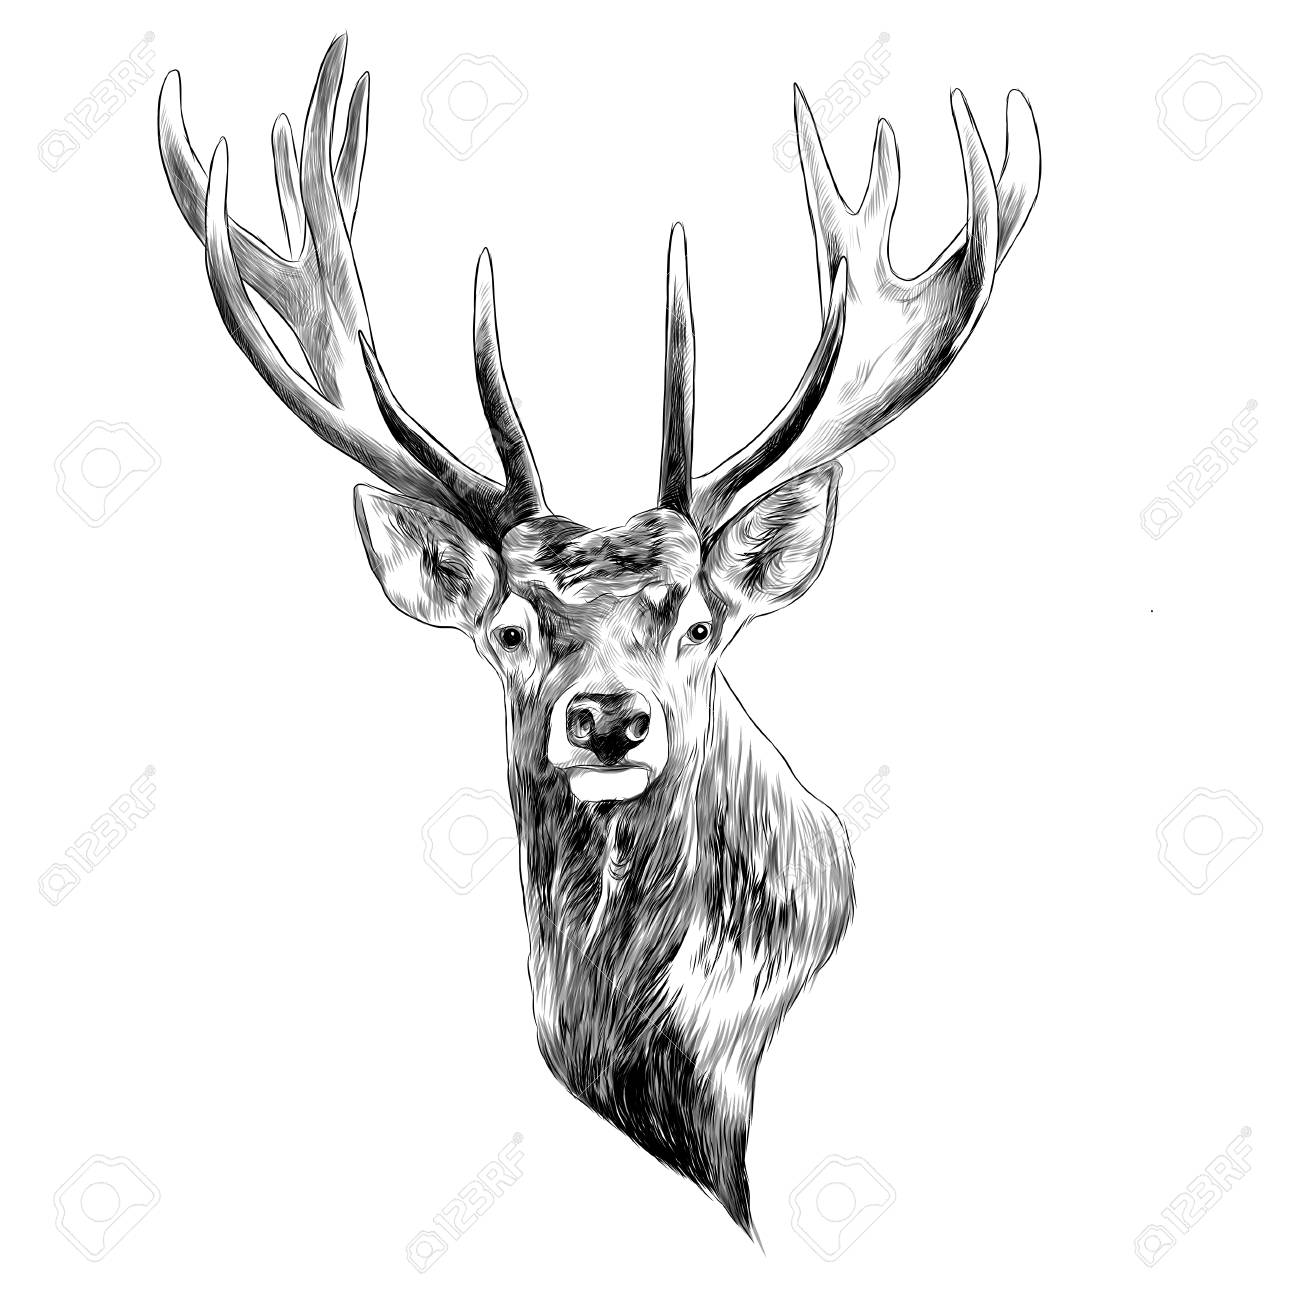 Stag deer head sketch graphic design. - 91604384